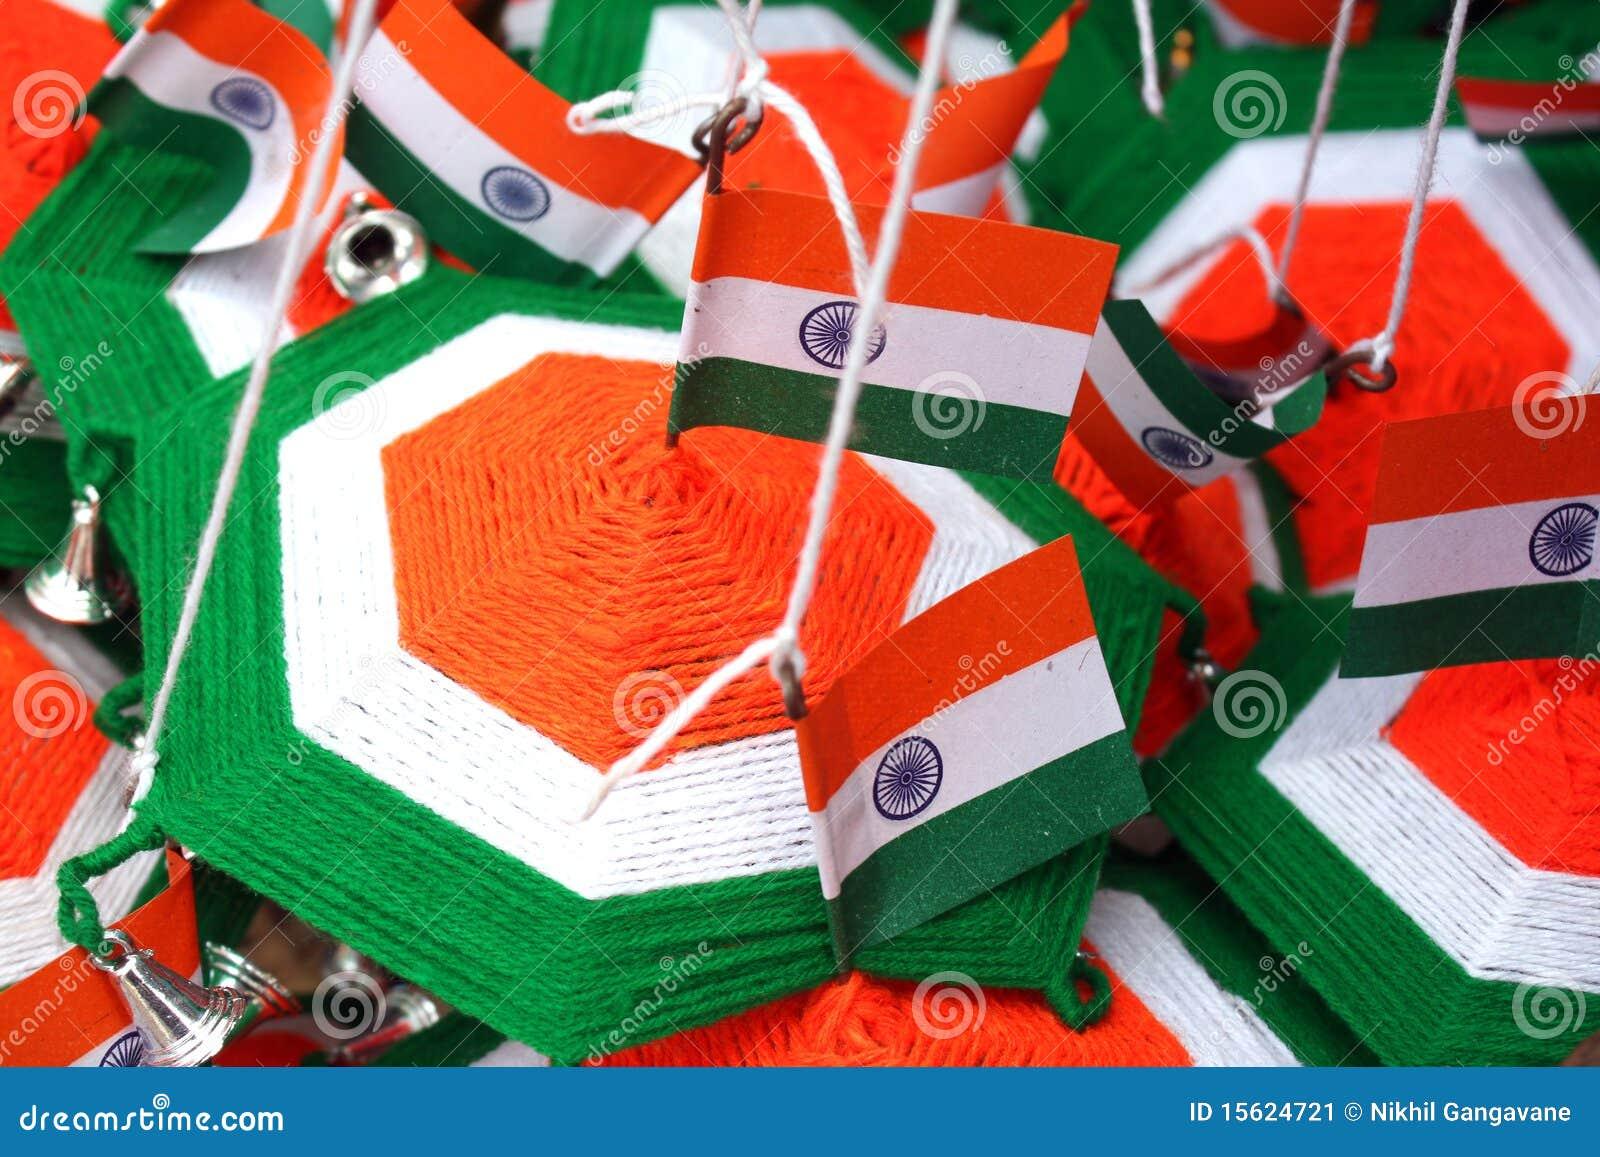 Indian Flag Theme: Indian Flag Decorations Stock Image